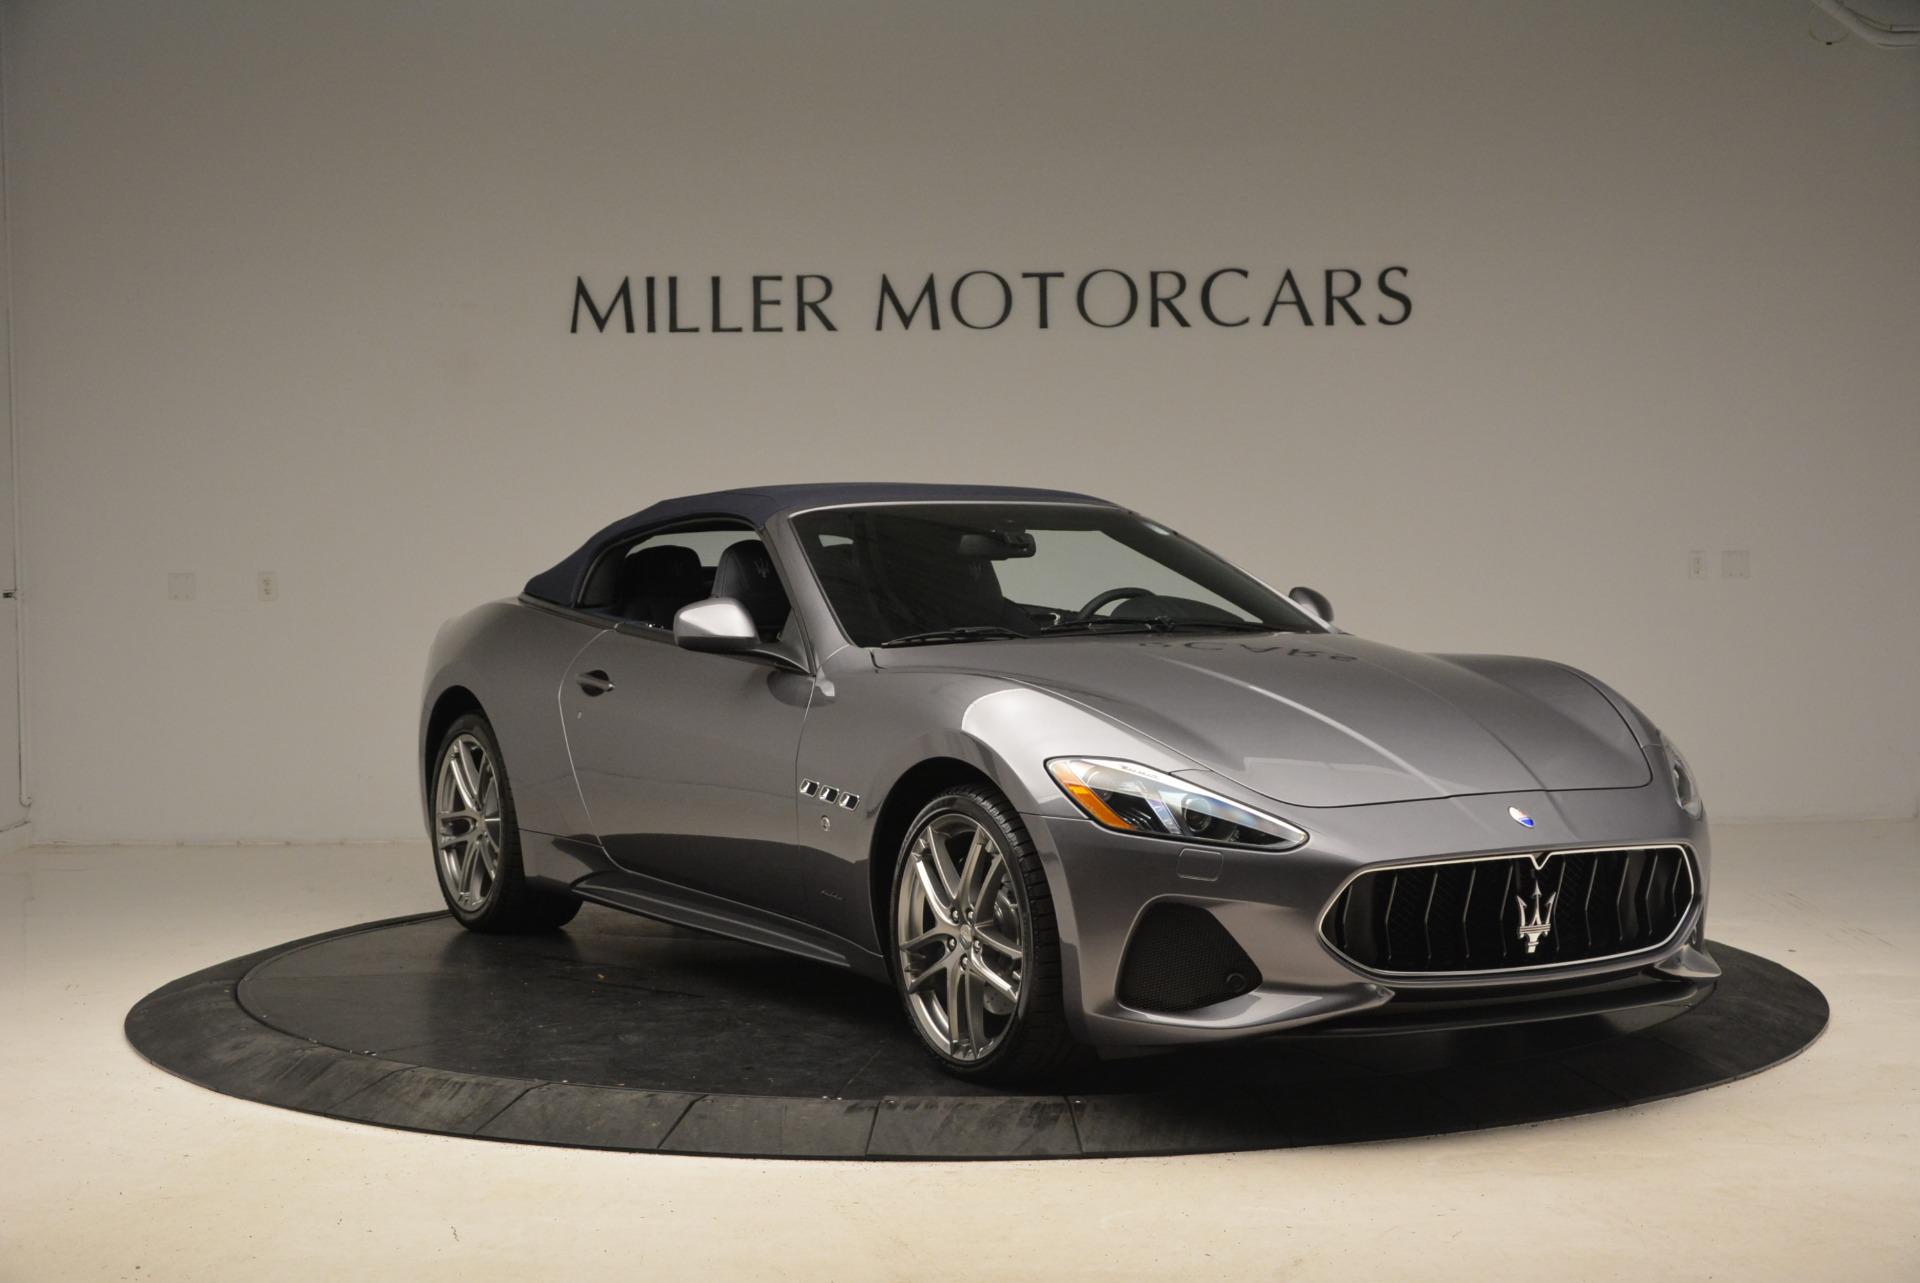 New 2018 Maserati GranTurismo Sport Convertible For Sale In Westport, CT 2140_p11